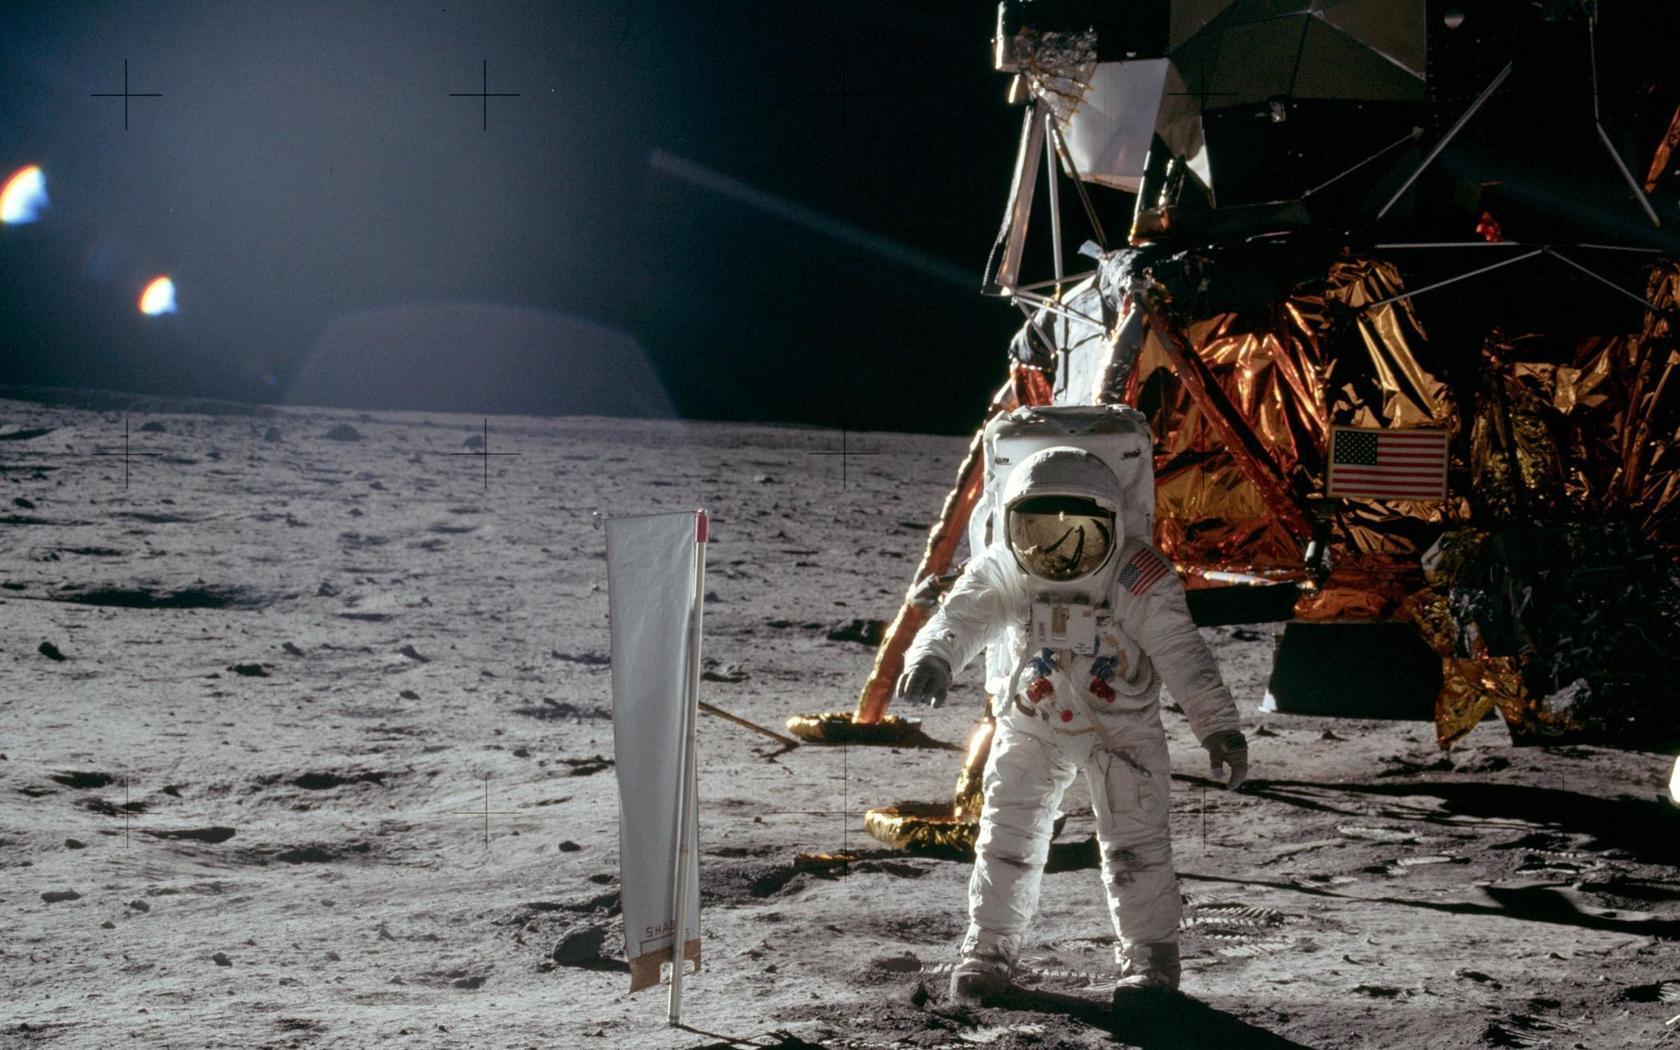 apollo_11_moon_landing-wide.jpg